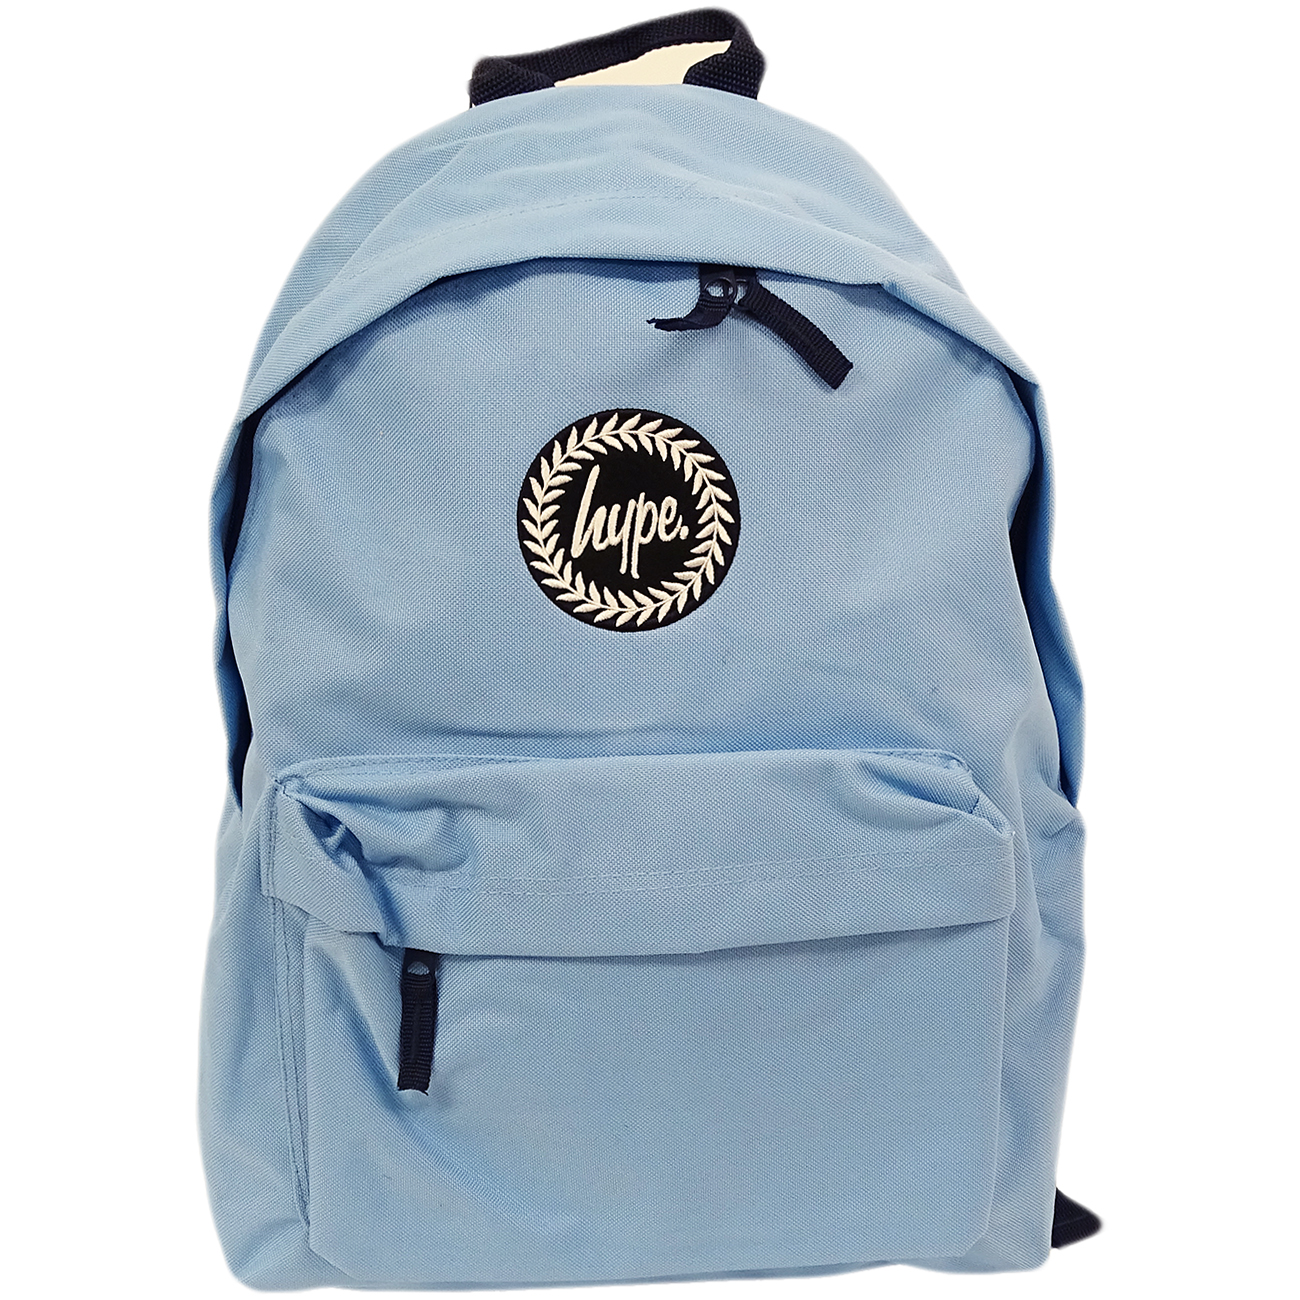 Just Hype Backpack Plain Pastel Blue Bag 5056120604364 32481502229b8